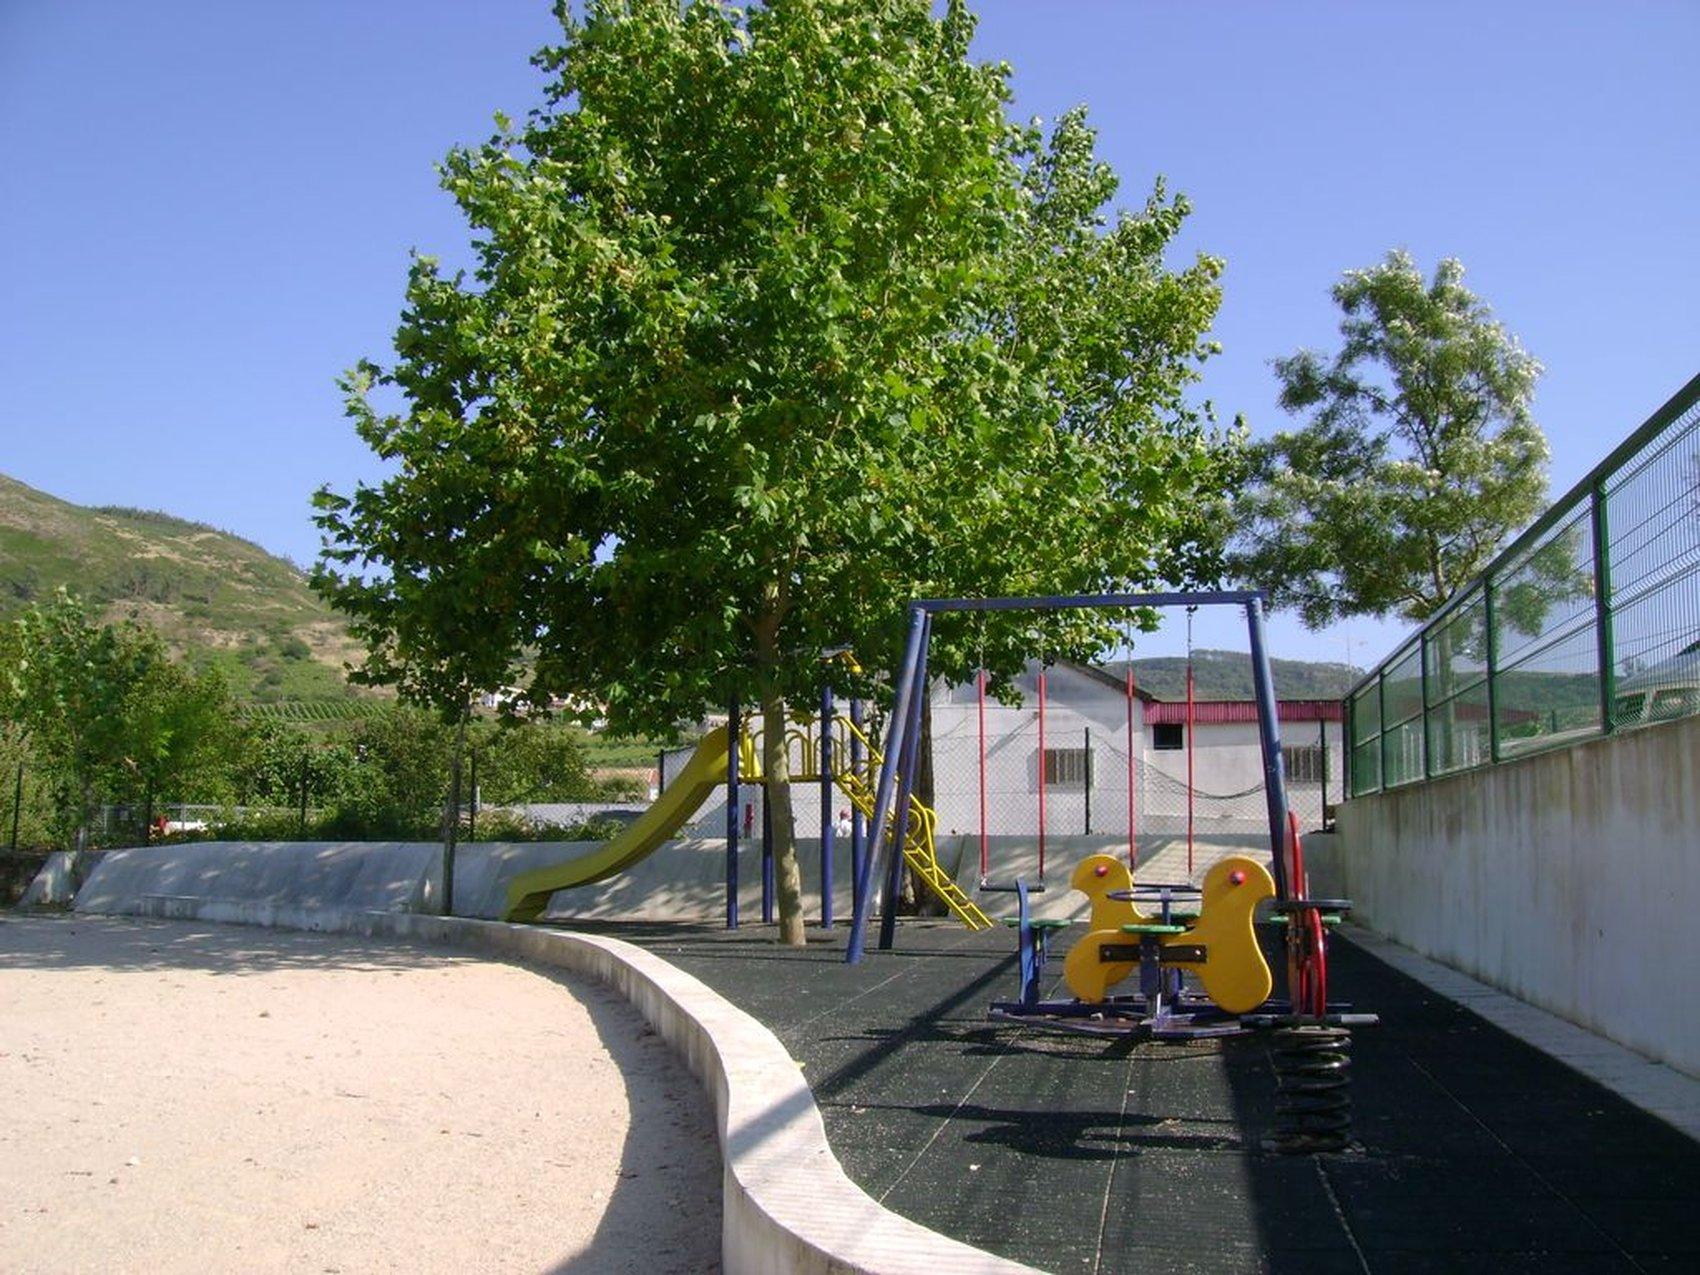 parque infantil pontesmonfalim